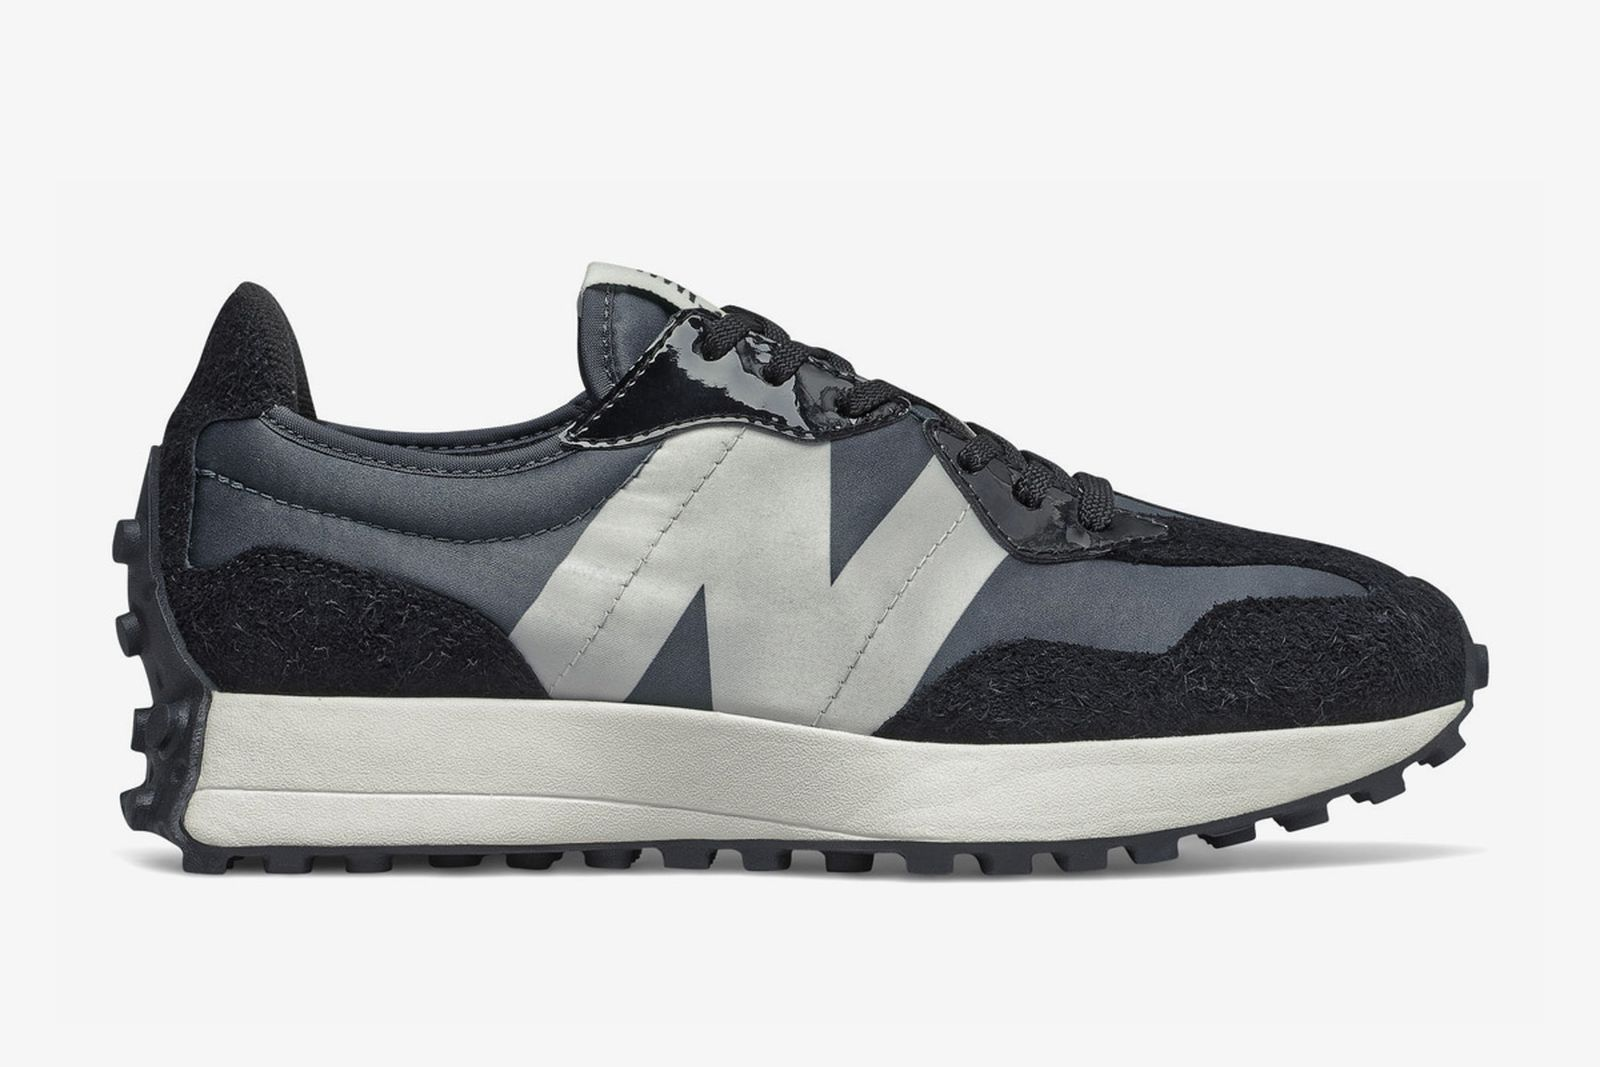 New Balance 327 satin black product shot